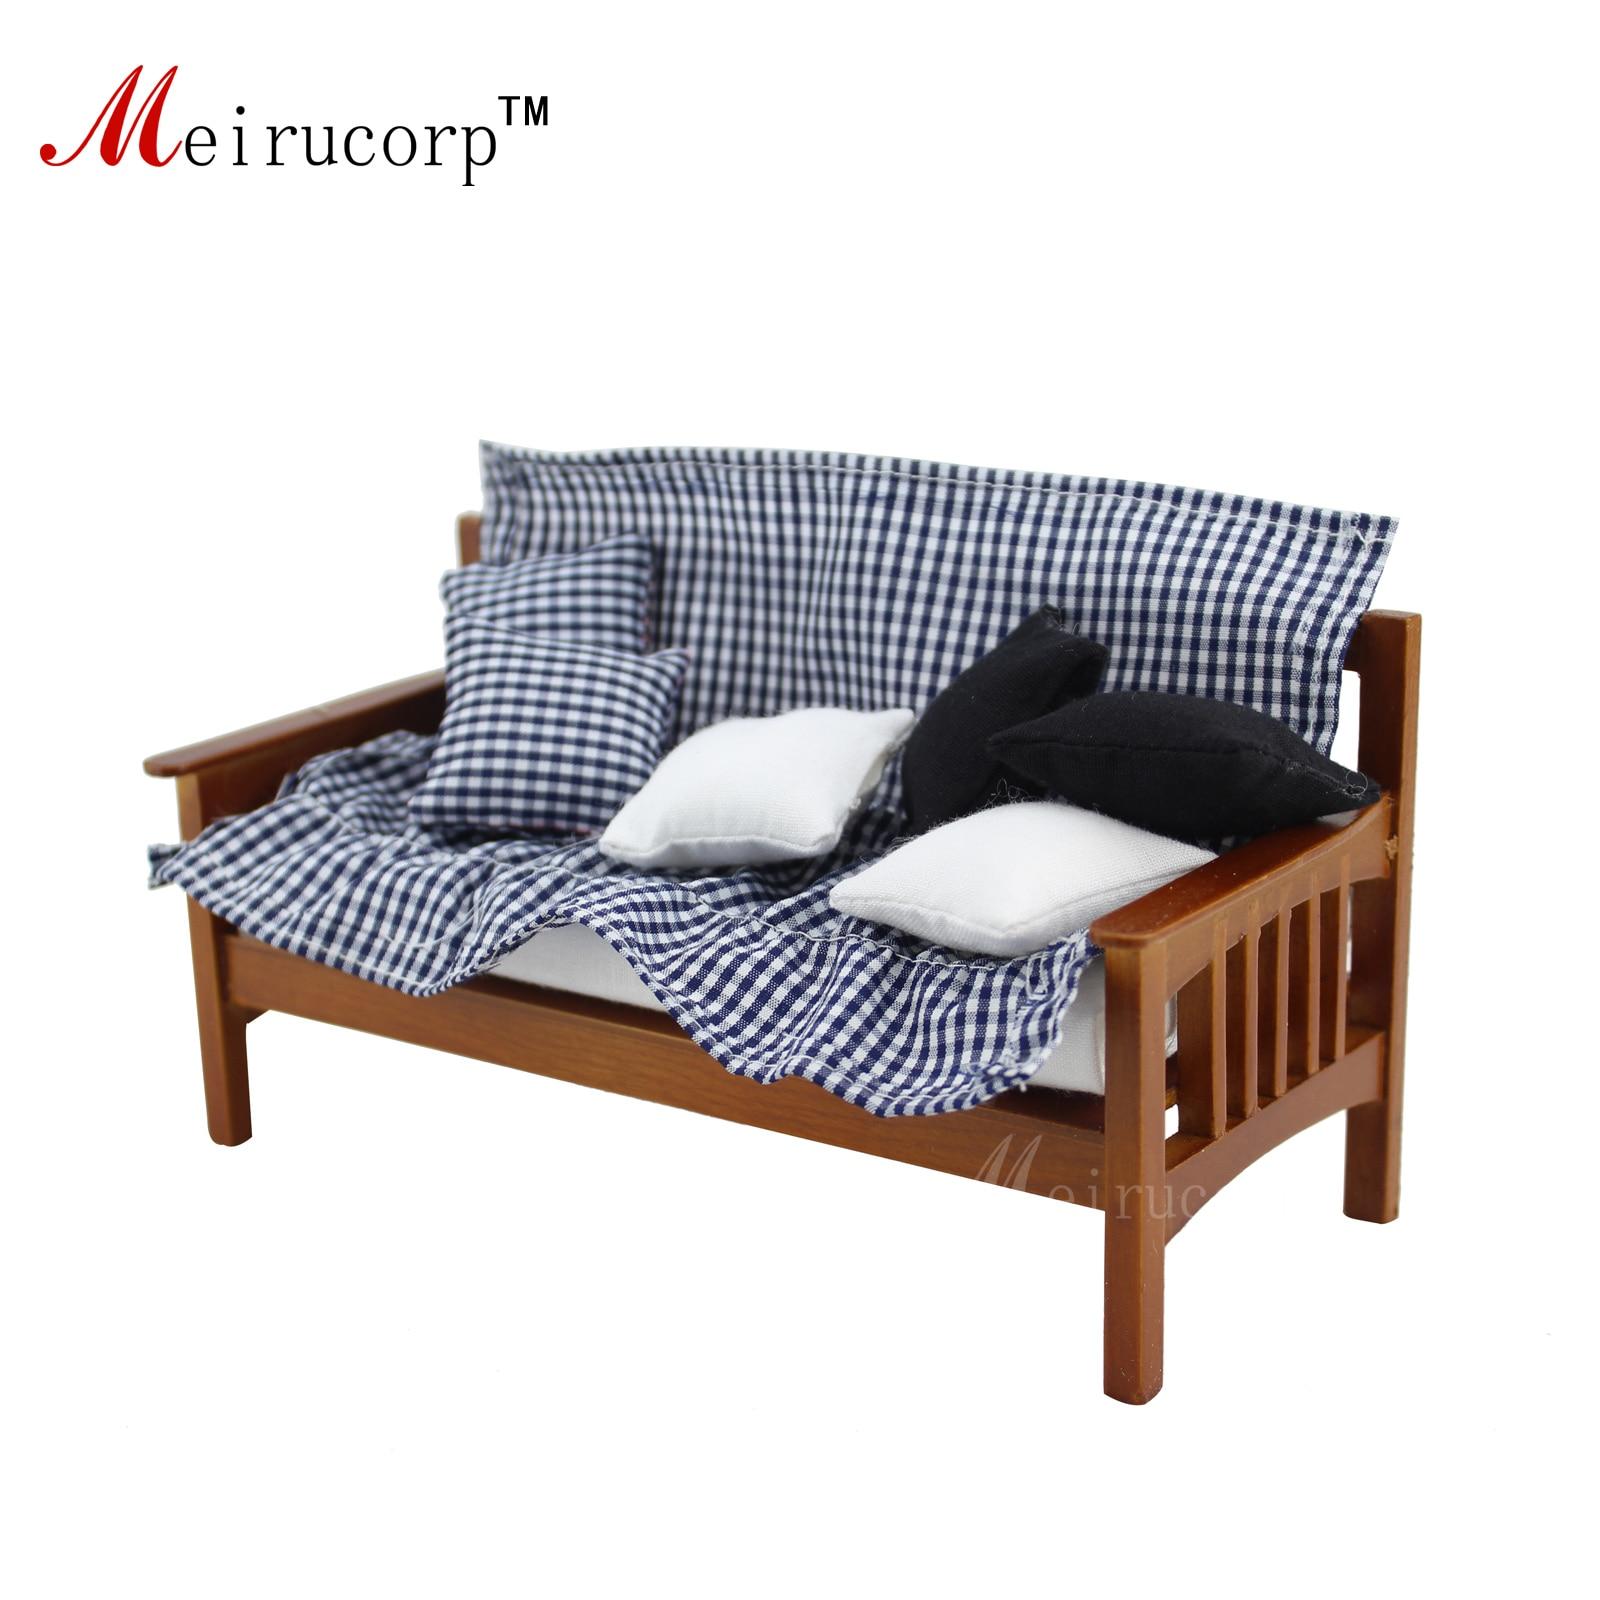 Dollhouse 1:12 مقیاس مبلمان مینیاتوری چوب دستی مونتاژ سه صندلی